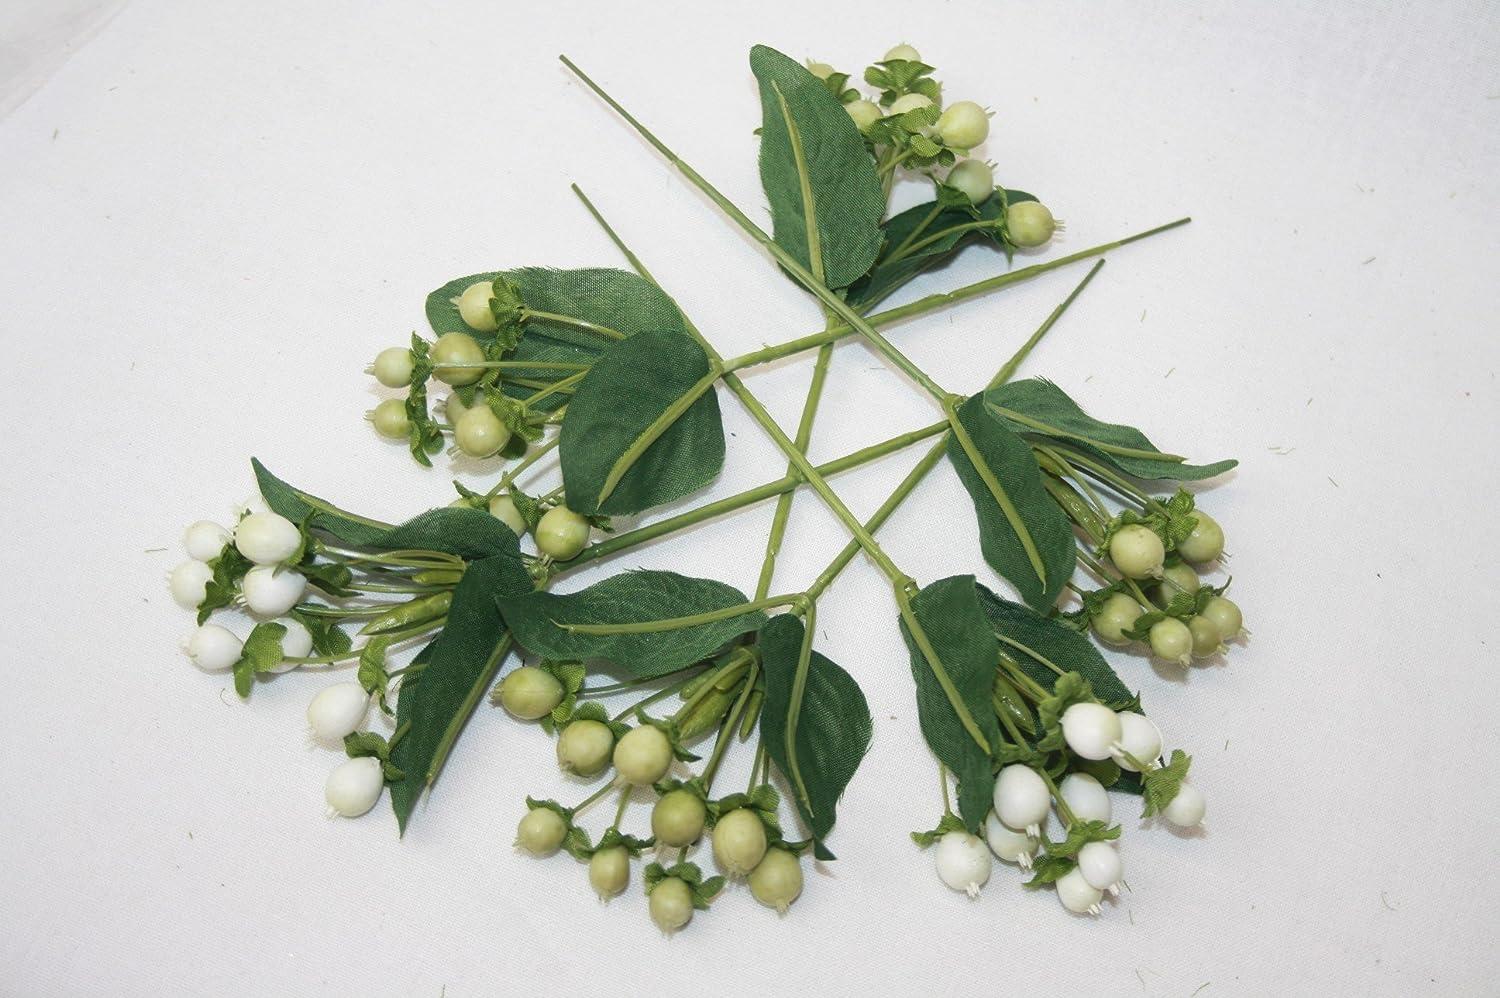 16cm Artificial Hypericum Berries - Green & White x 6 Sprays Groves